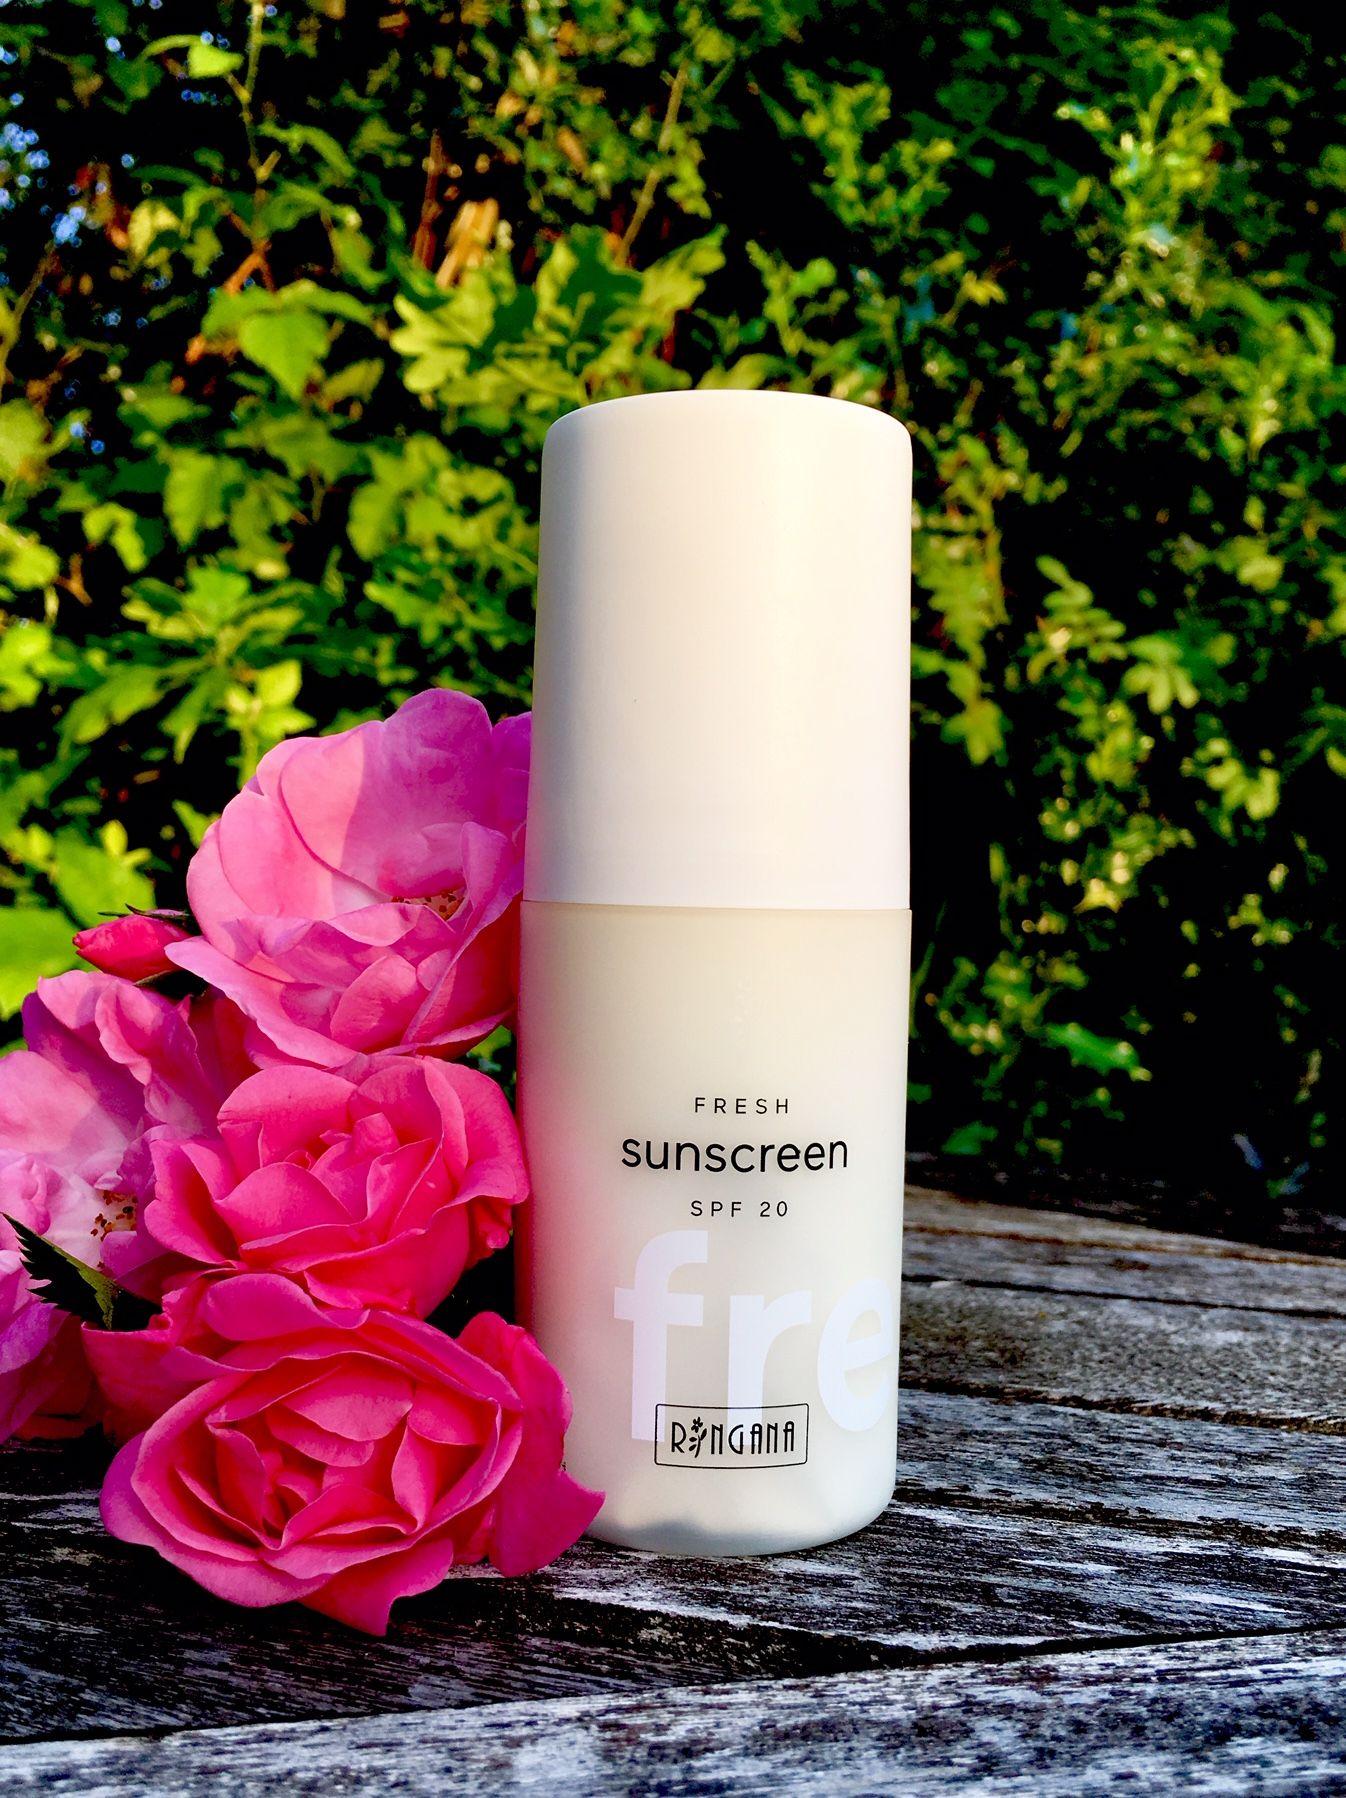 Fresh Sunscreen Is everyone ready for fun in the sun? ☀️☀️